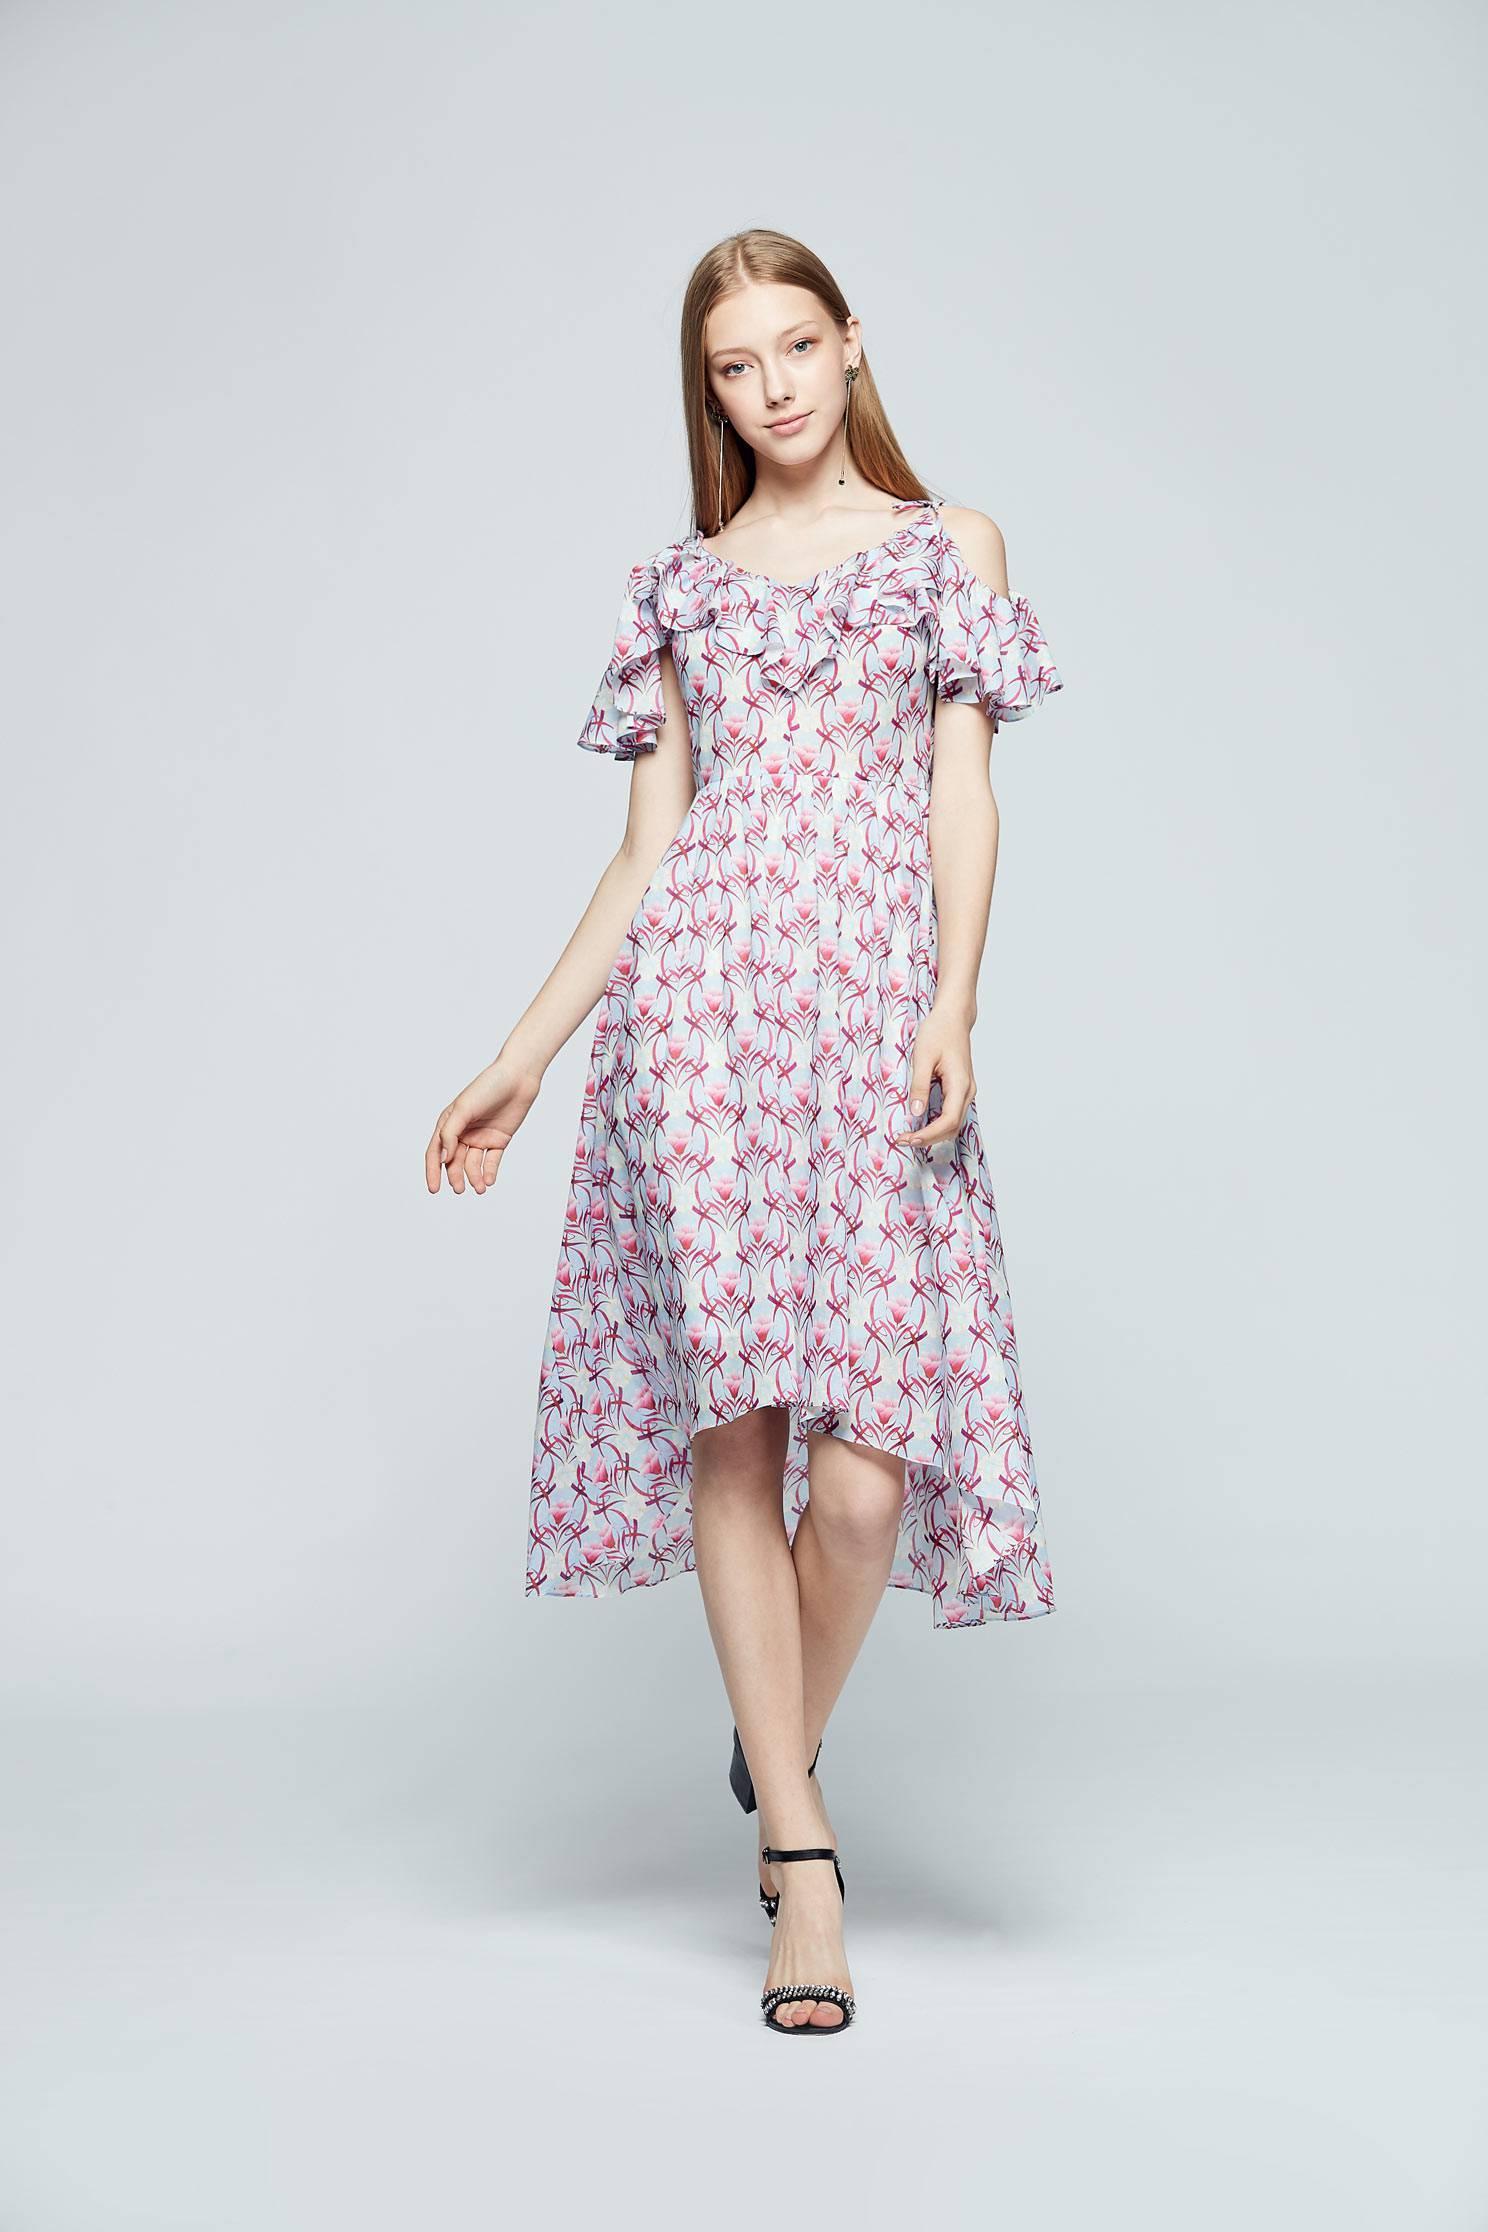 Elegant floral fashion dress,dress,printeddress,cocktaildress,sleevelessdress,spaghettistrap,spaghettistrapdress,chiffon,chiffondress